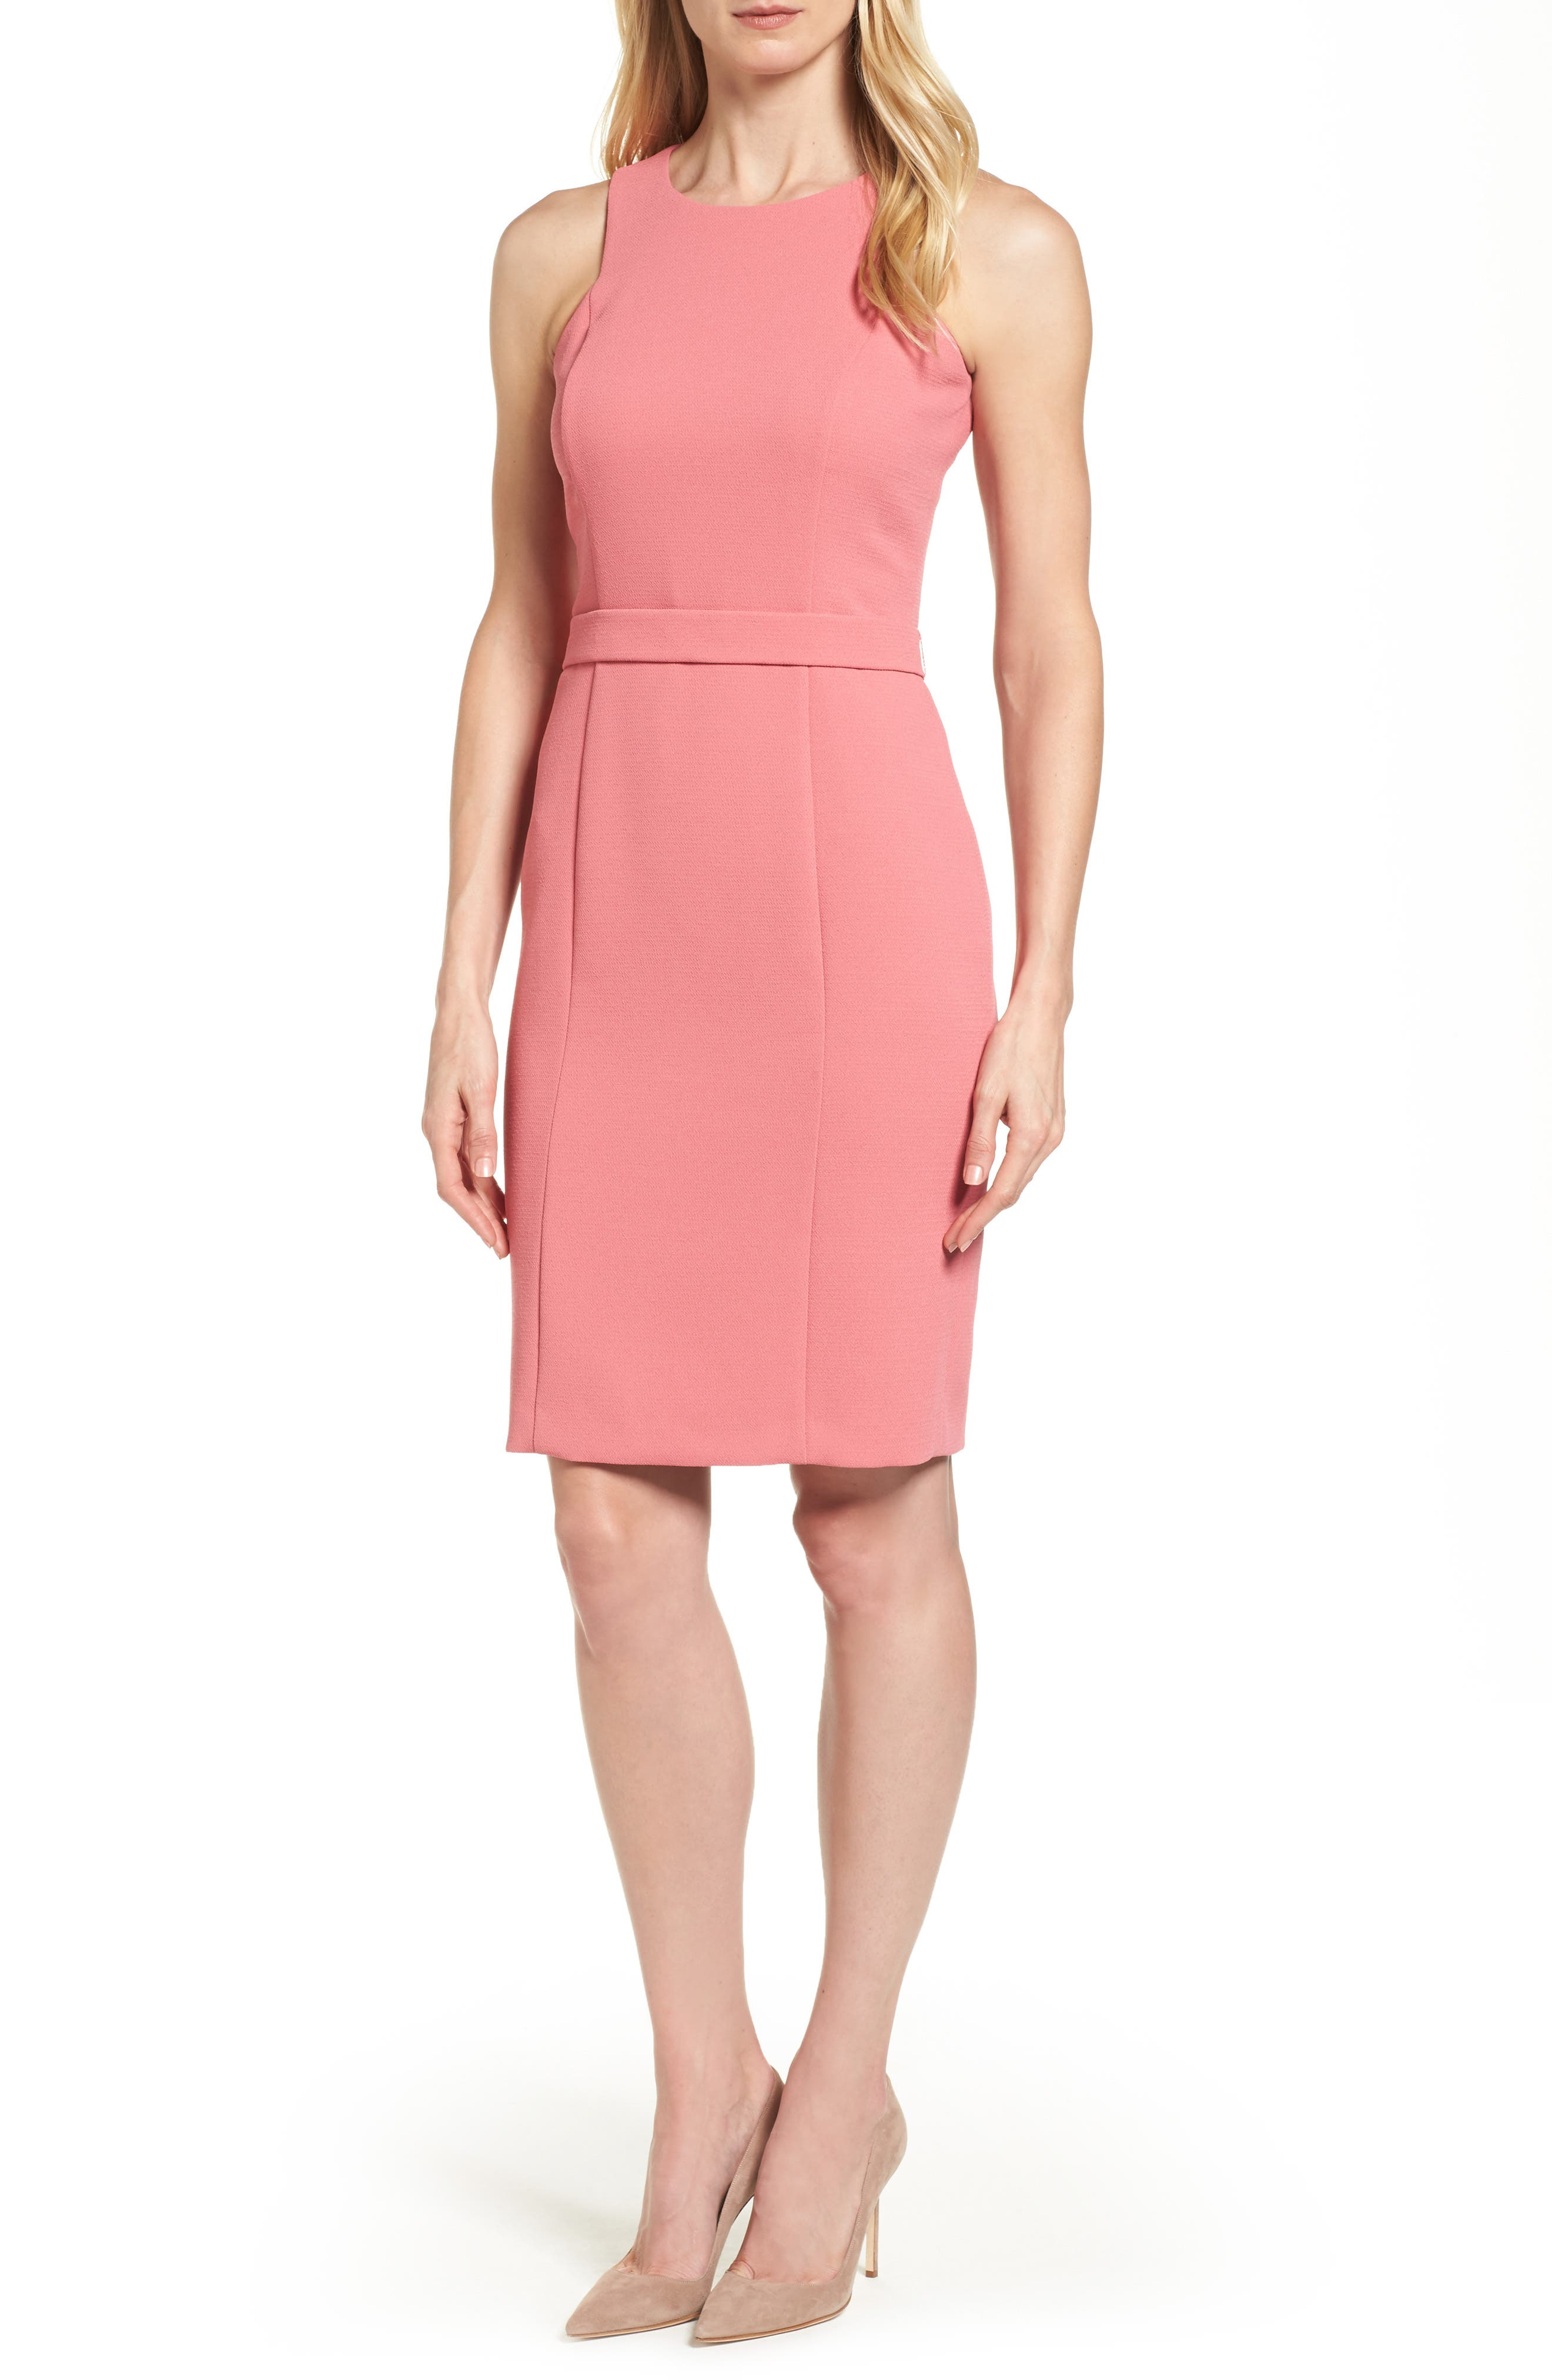 Dalanea Belted Sheath Dress,                         Main,                         color,